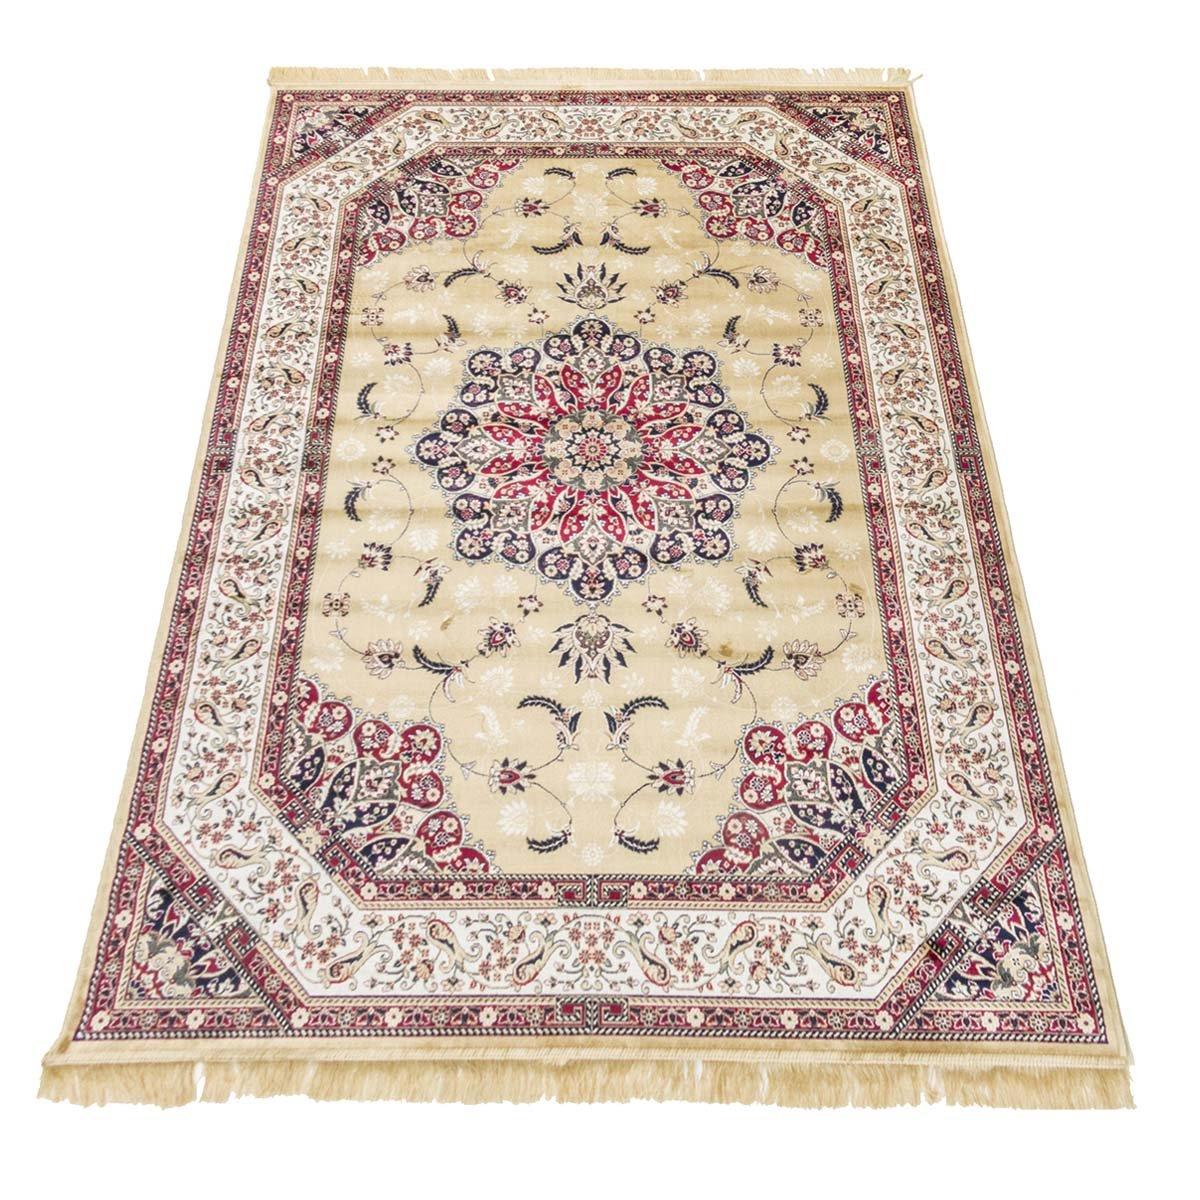 WEBTAPPETI Teppich Klassisch Keshan Teppich Teppich Teppich Kunst Seide Rubine 317-Gold cm.200x290 Gold B00NTVDG3U Teppiche 50d8cd